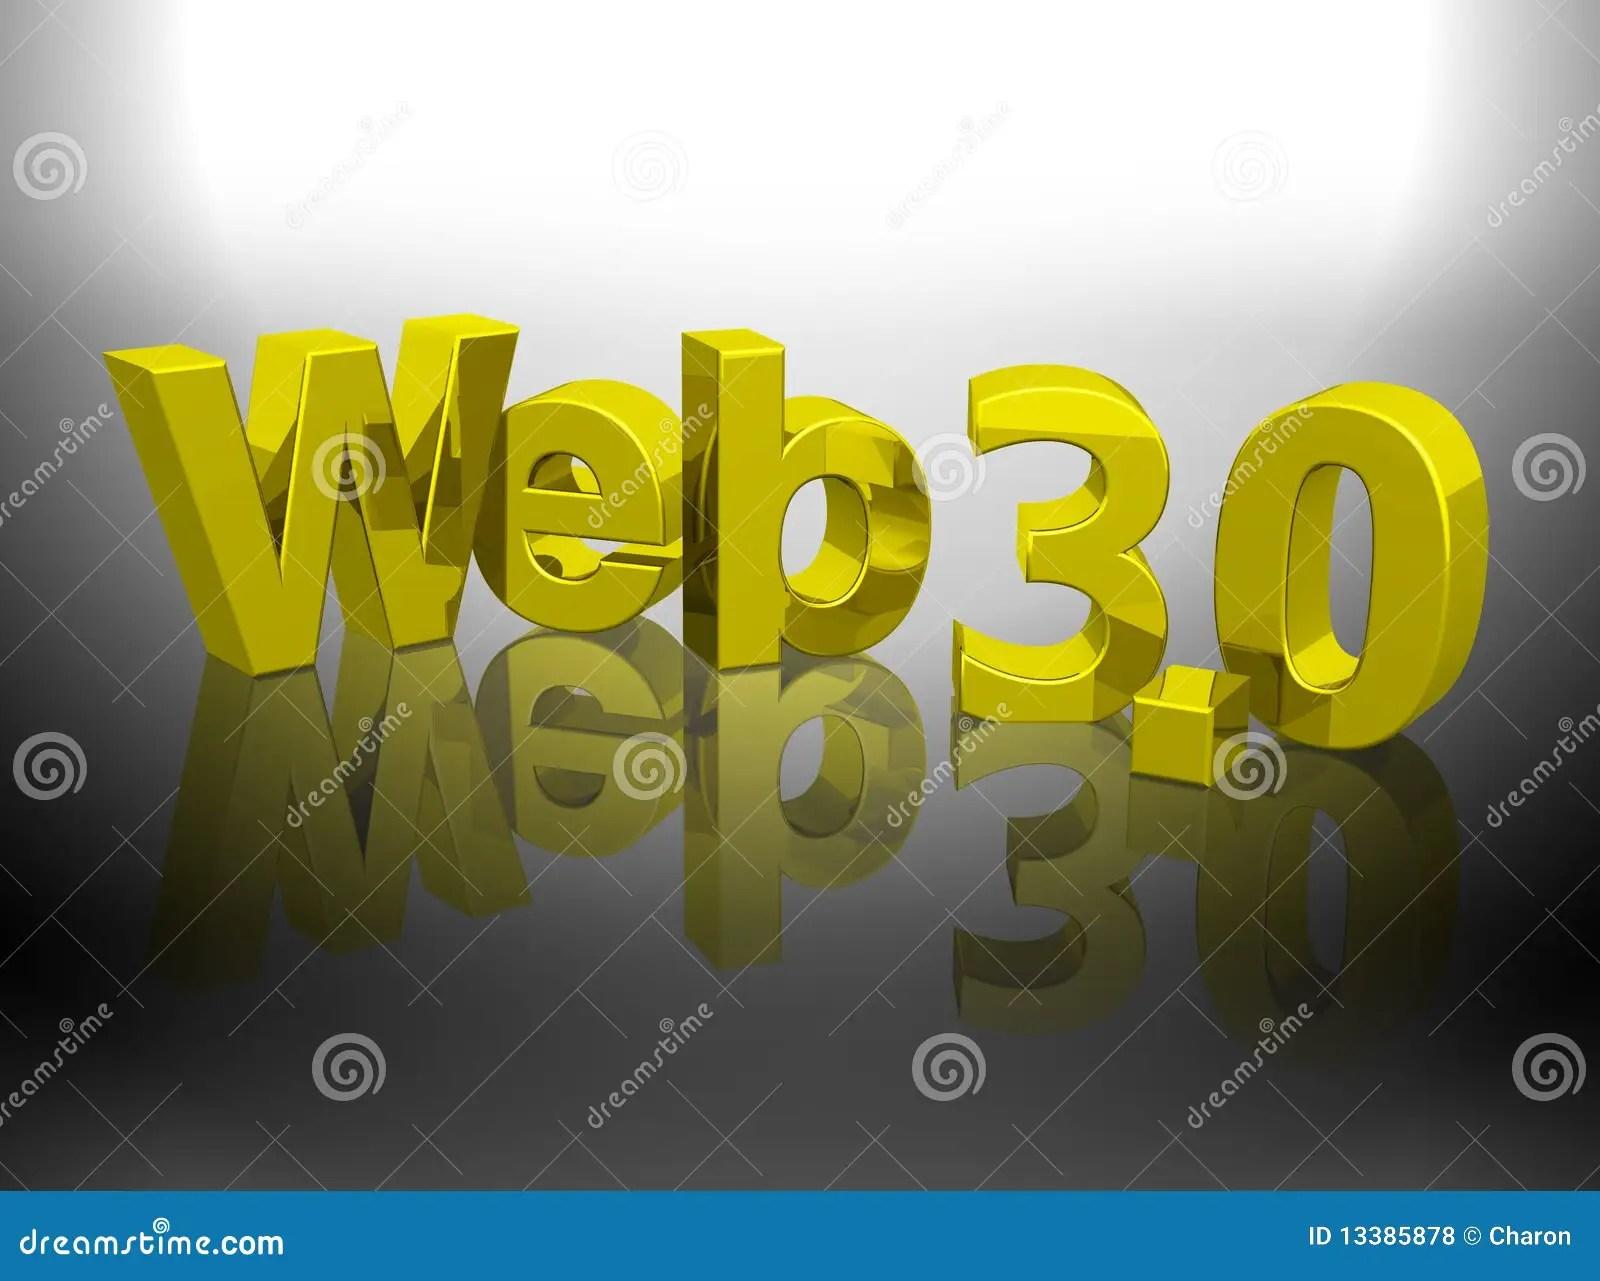 Web 3 0 3d Gold Shiny Word Royalty Free Stock Photos